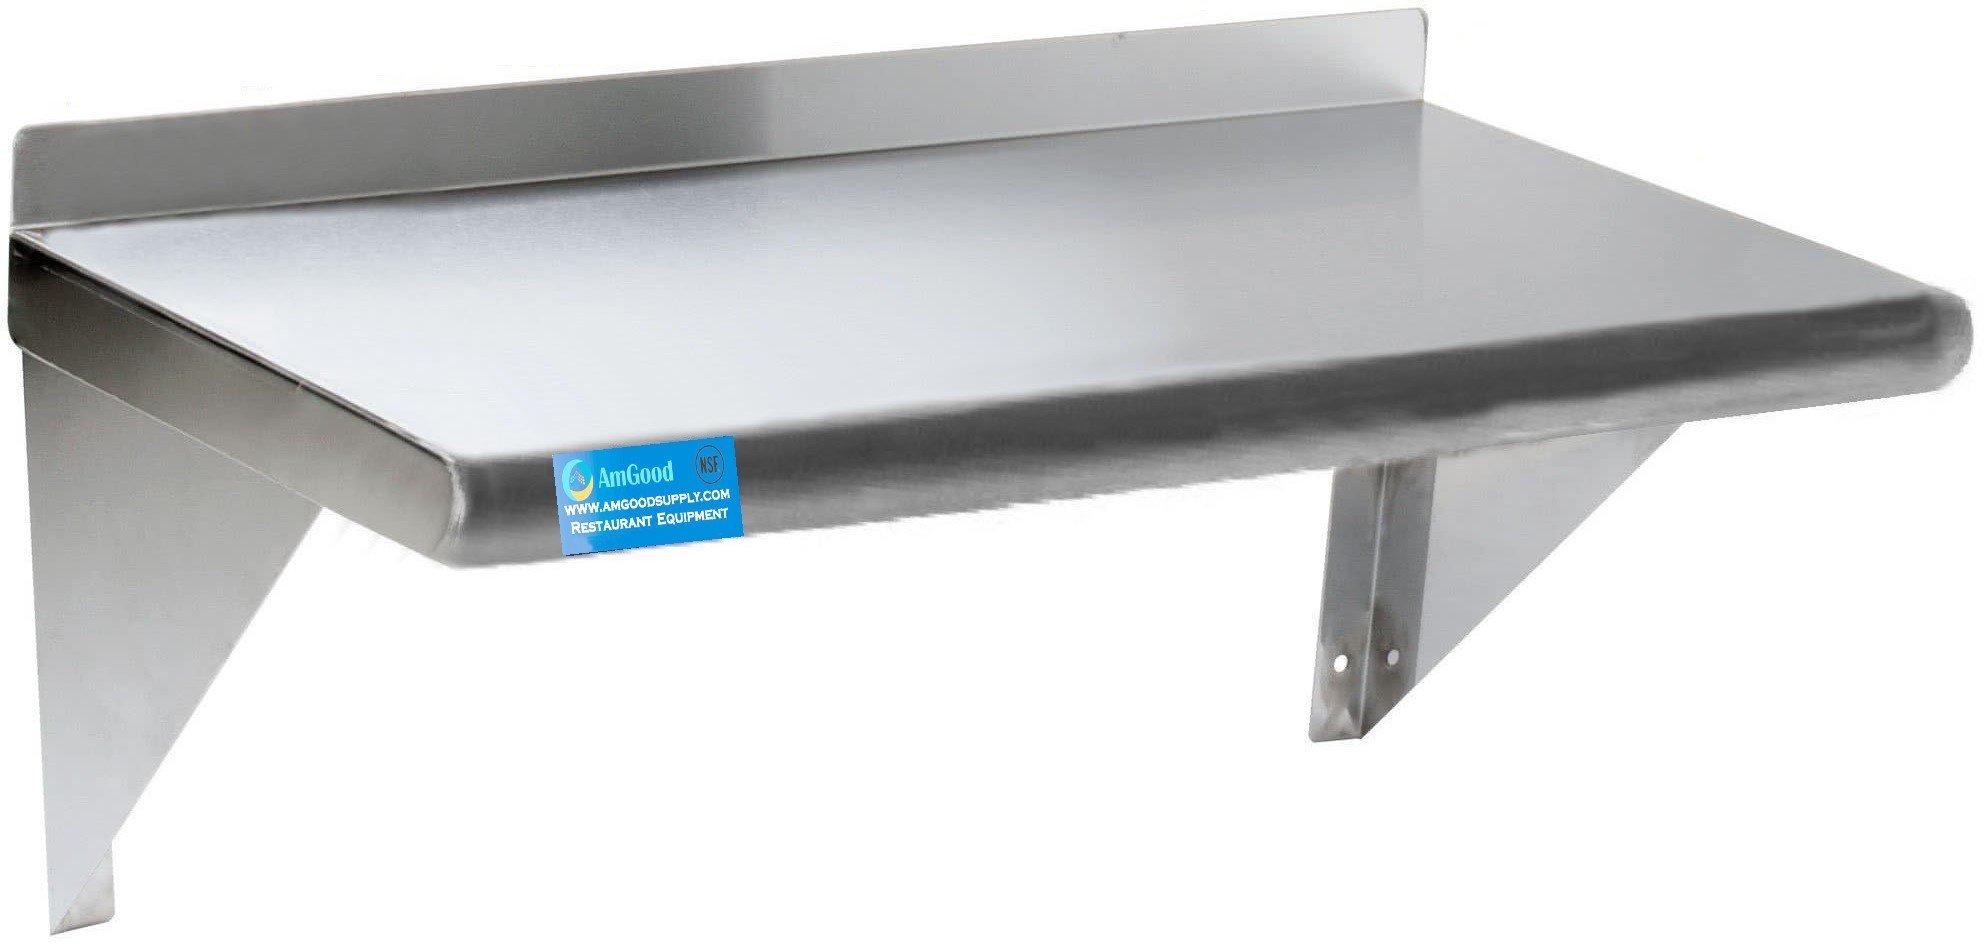 18'' X 24'' Stainless Steel Wall Shelf | NSF Certified | Appliance & Equipment Metal Shelving | Kitchen, Restaurant, Garage, Laundry, Utility Room